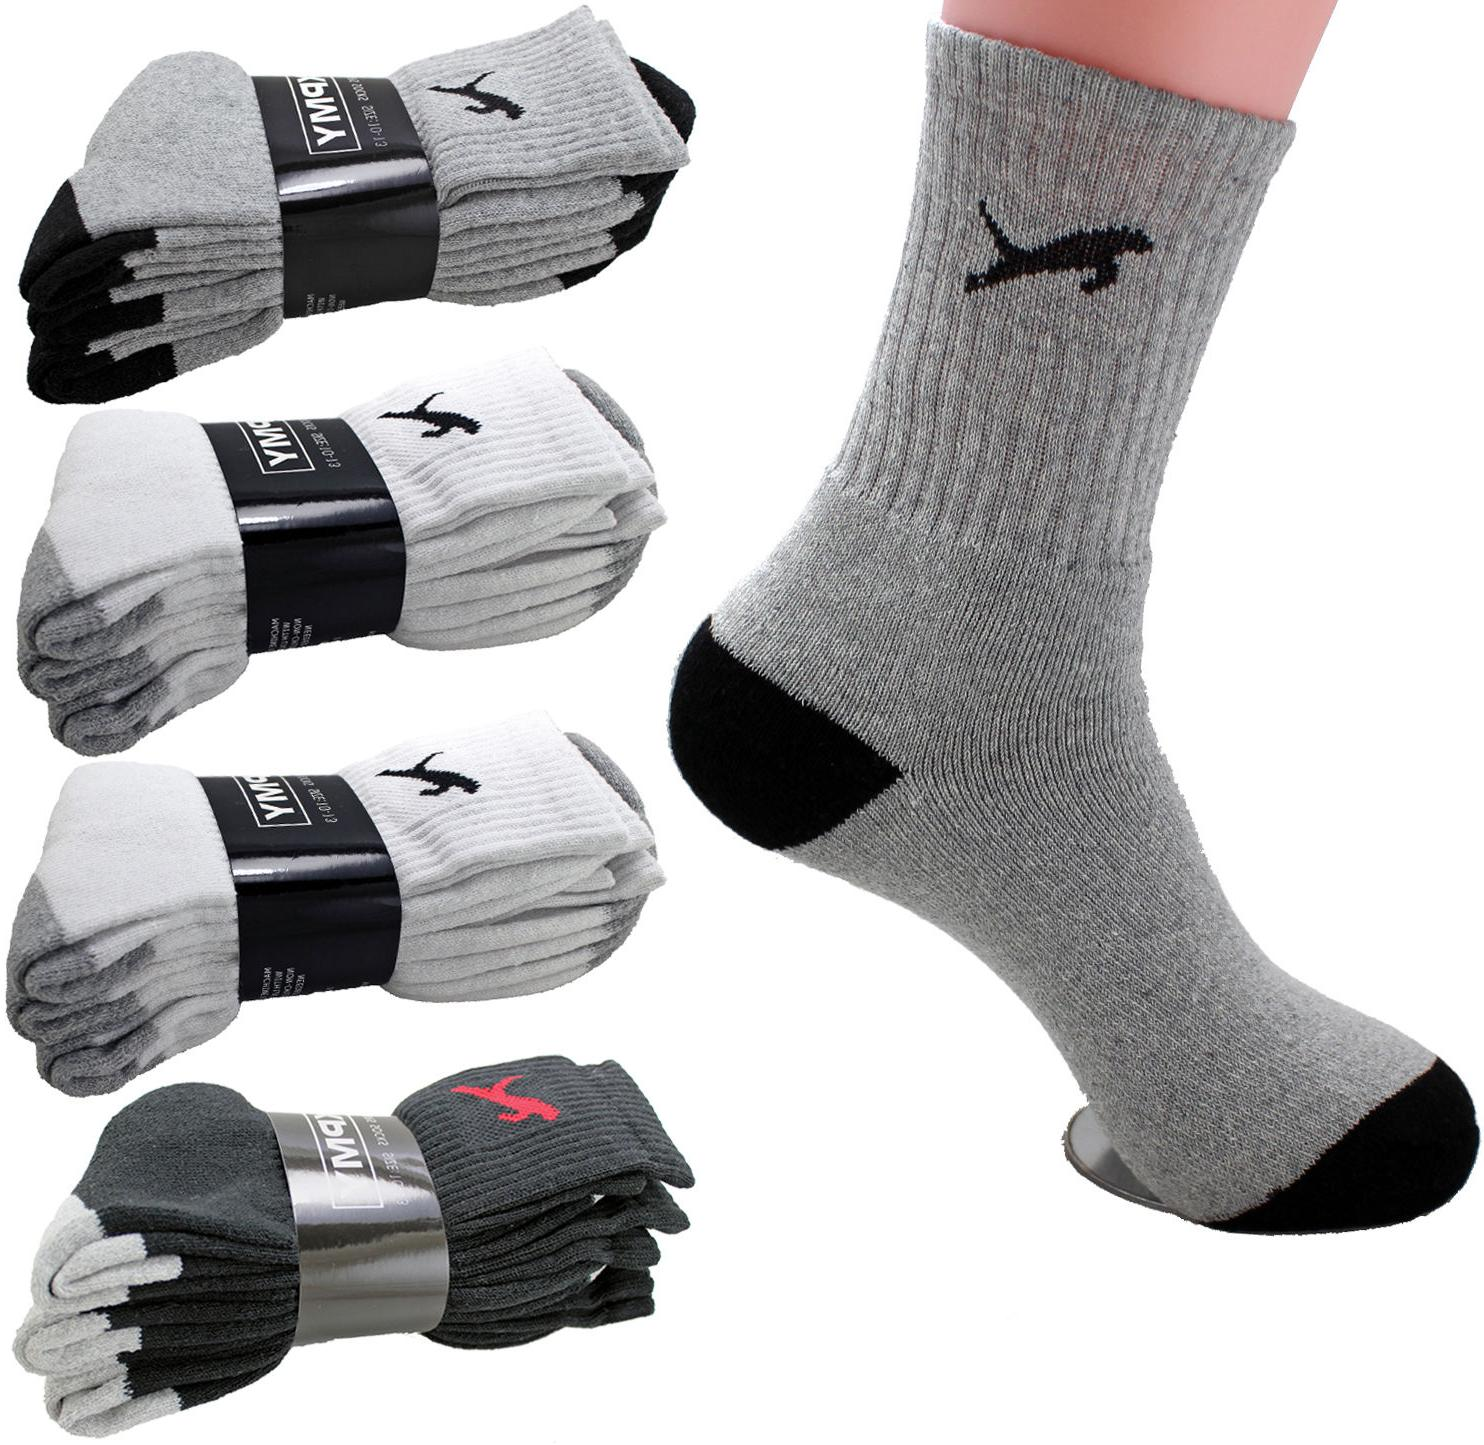 new 3 6 12 pairs mens sports